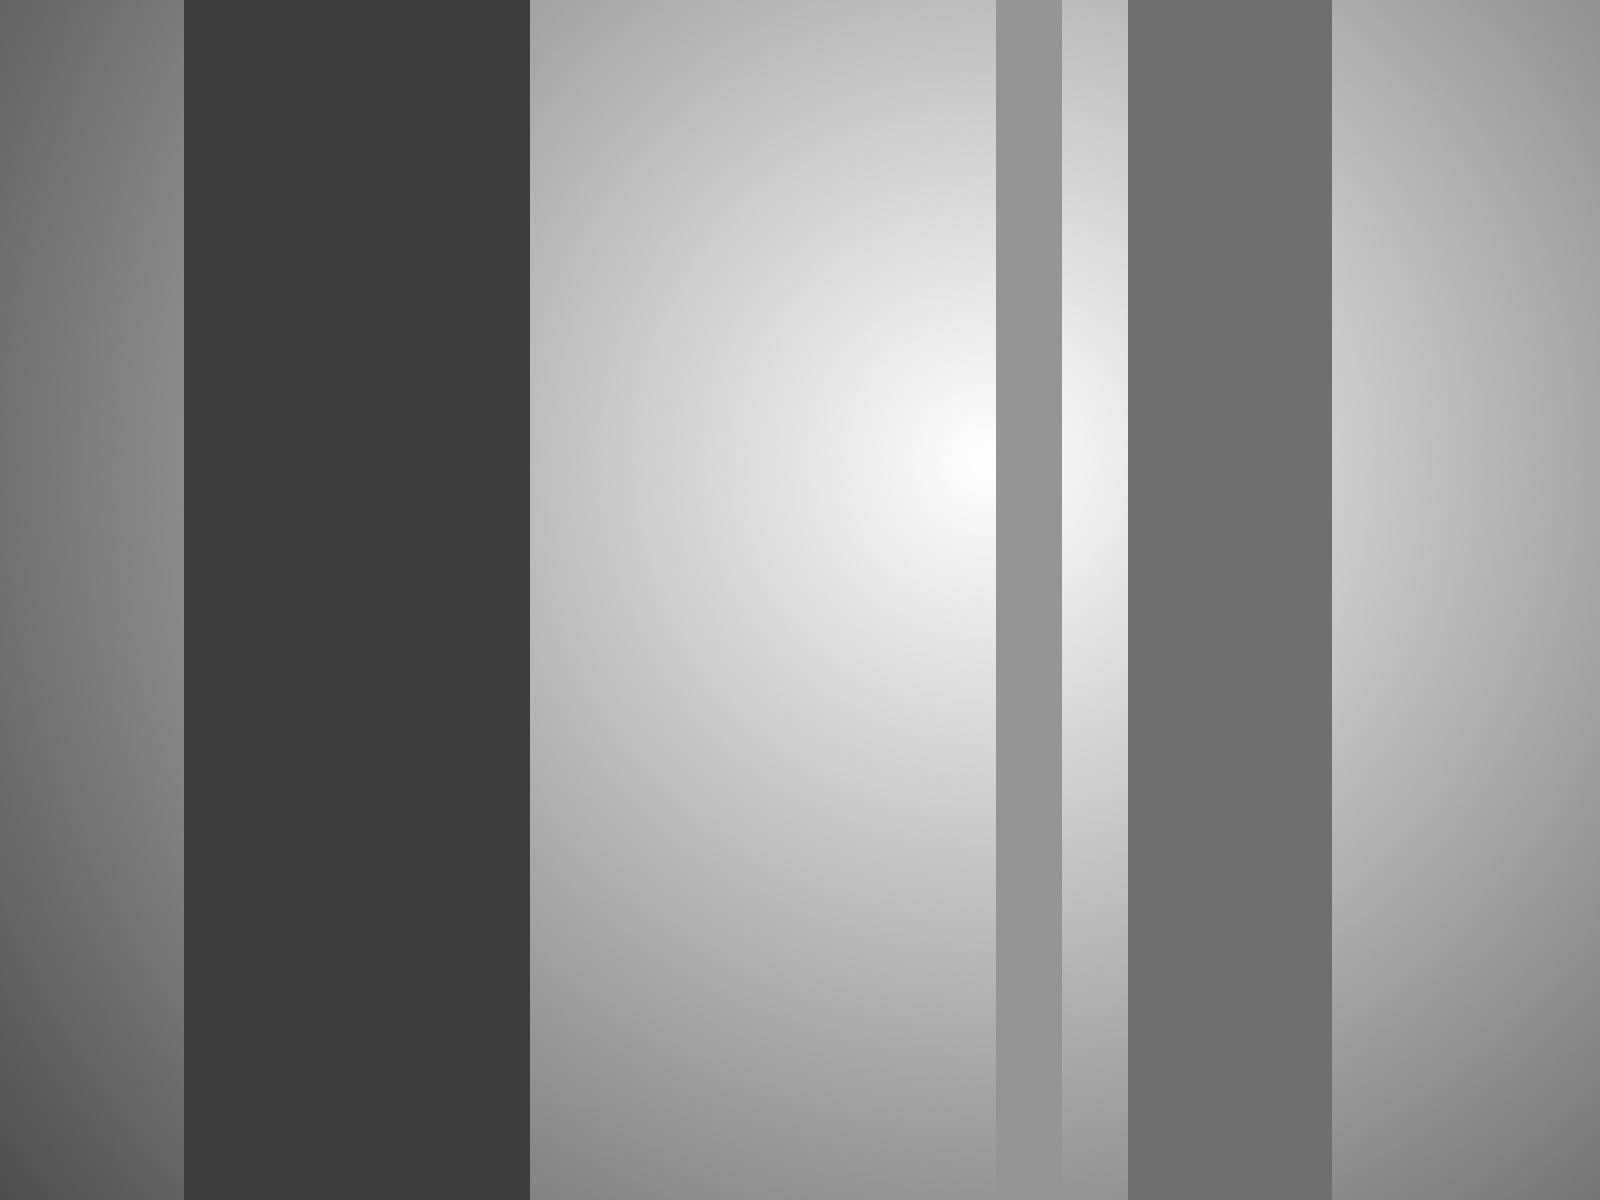 Grey Stripes Computer Wallpapers Desktop Backgrounds 1600x1200 ID 1600x1200